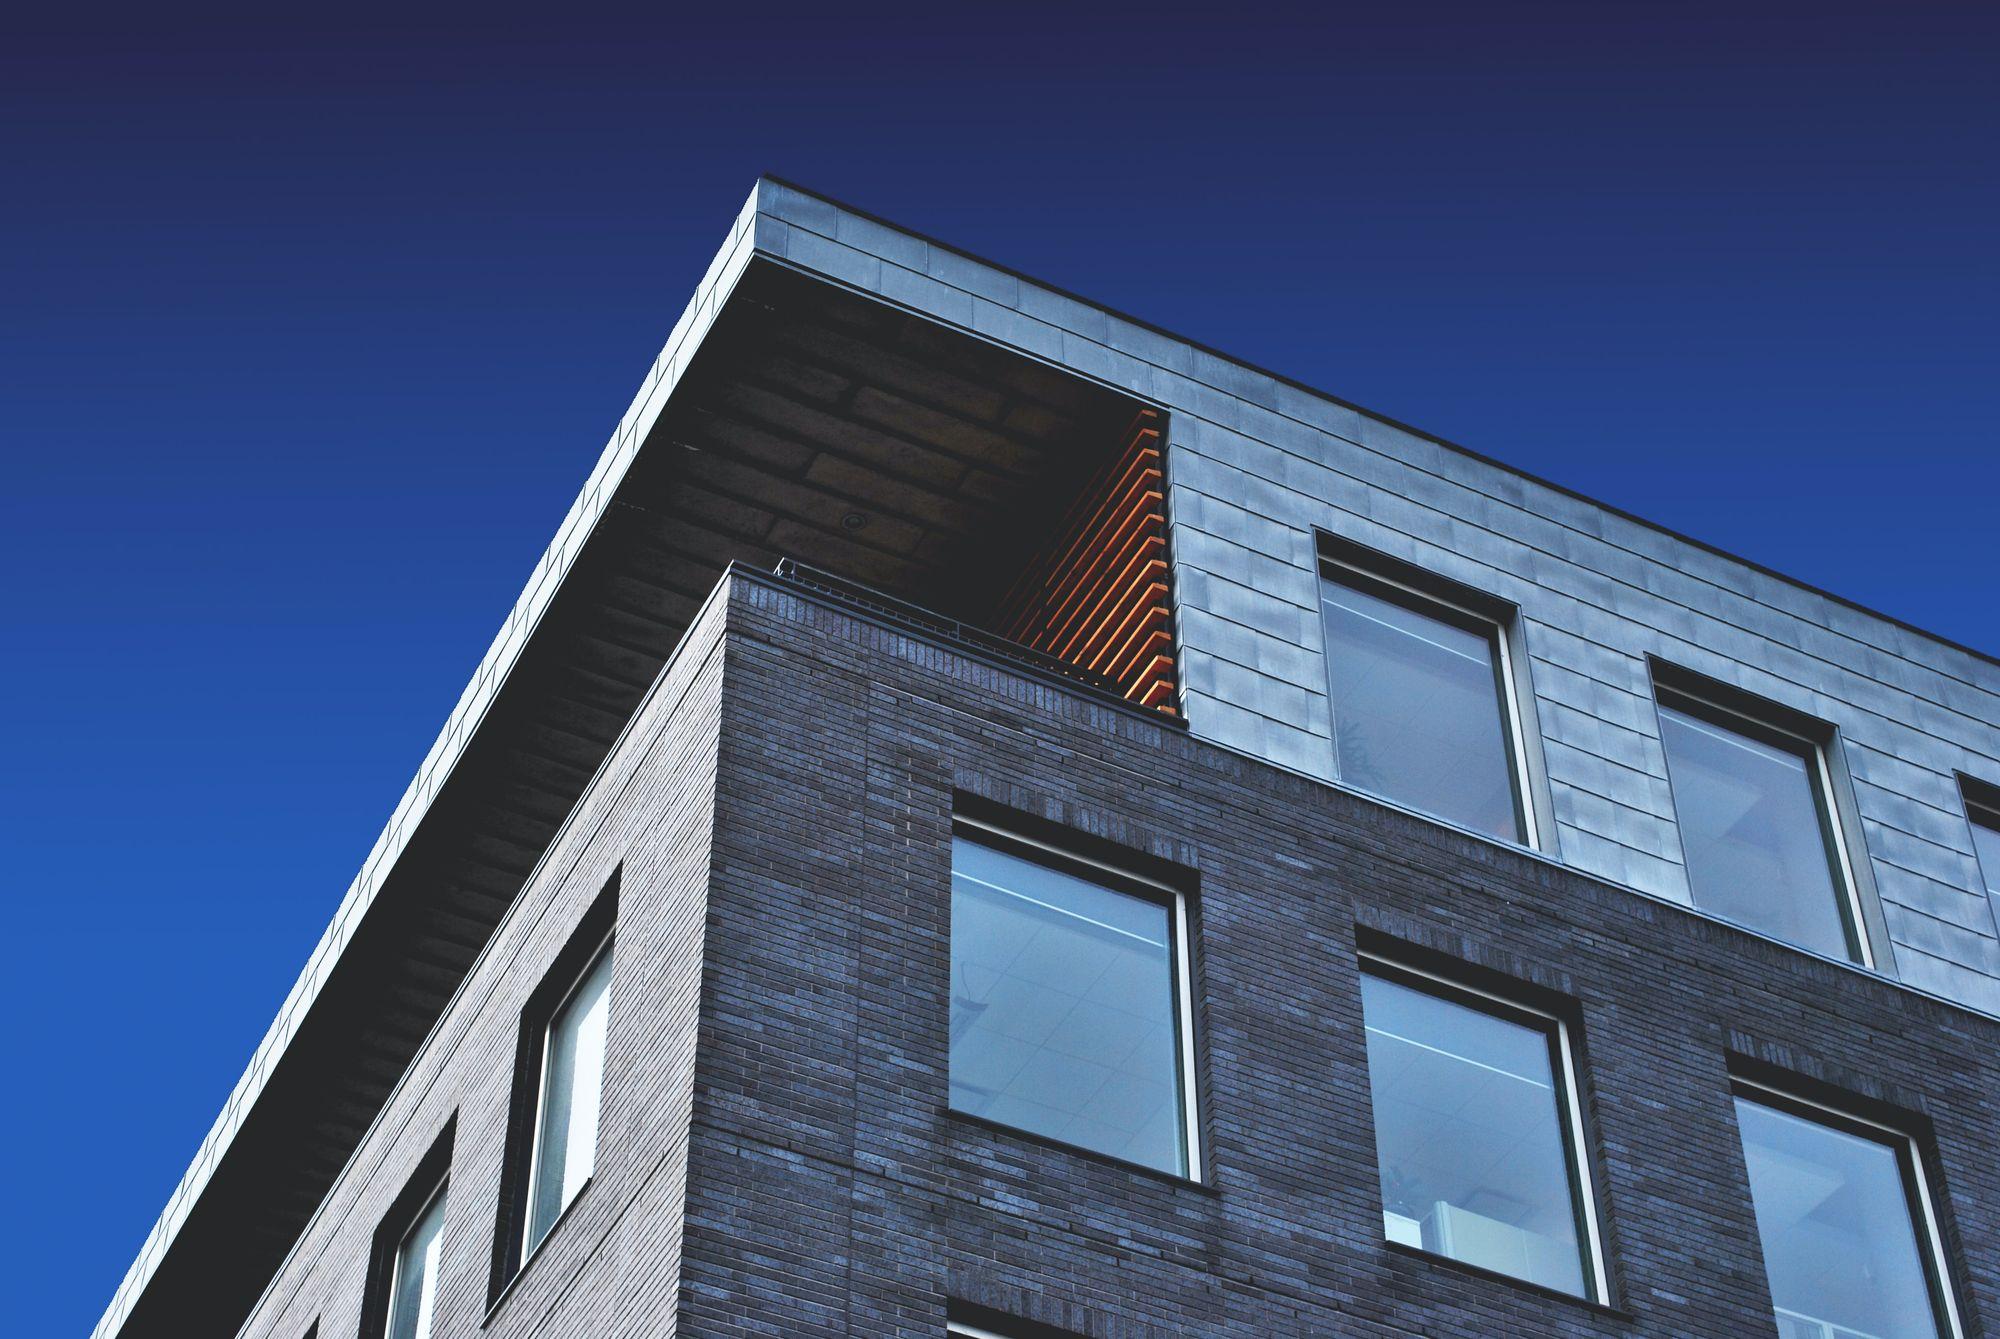 Real Estate developers -  Take The Digital Leap